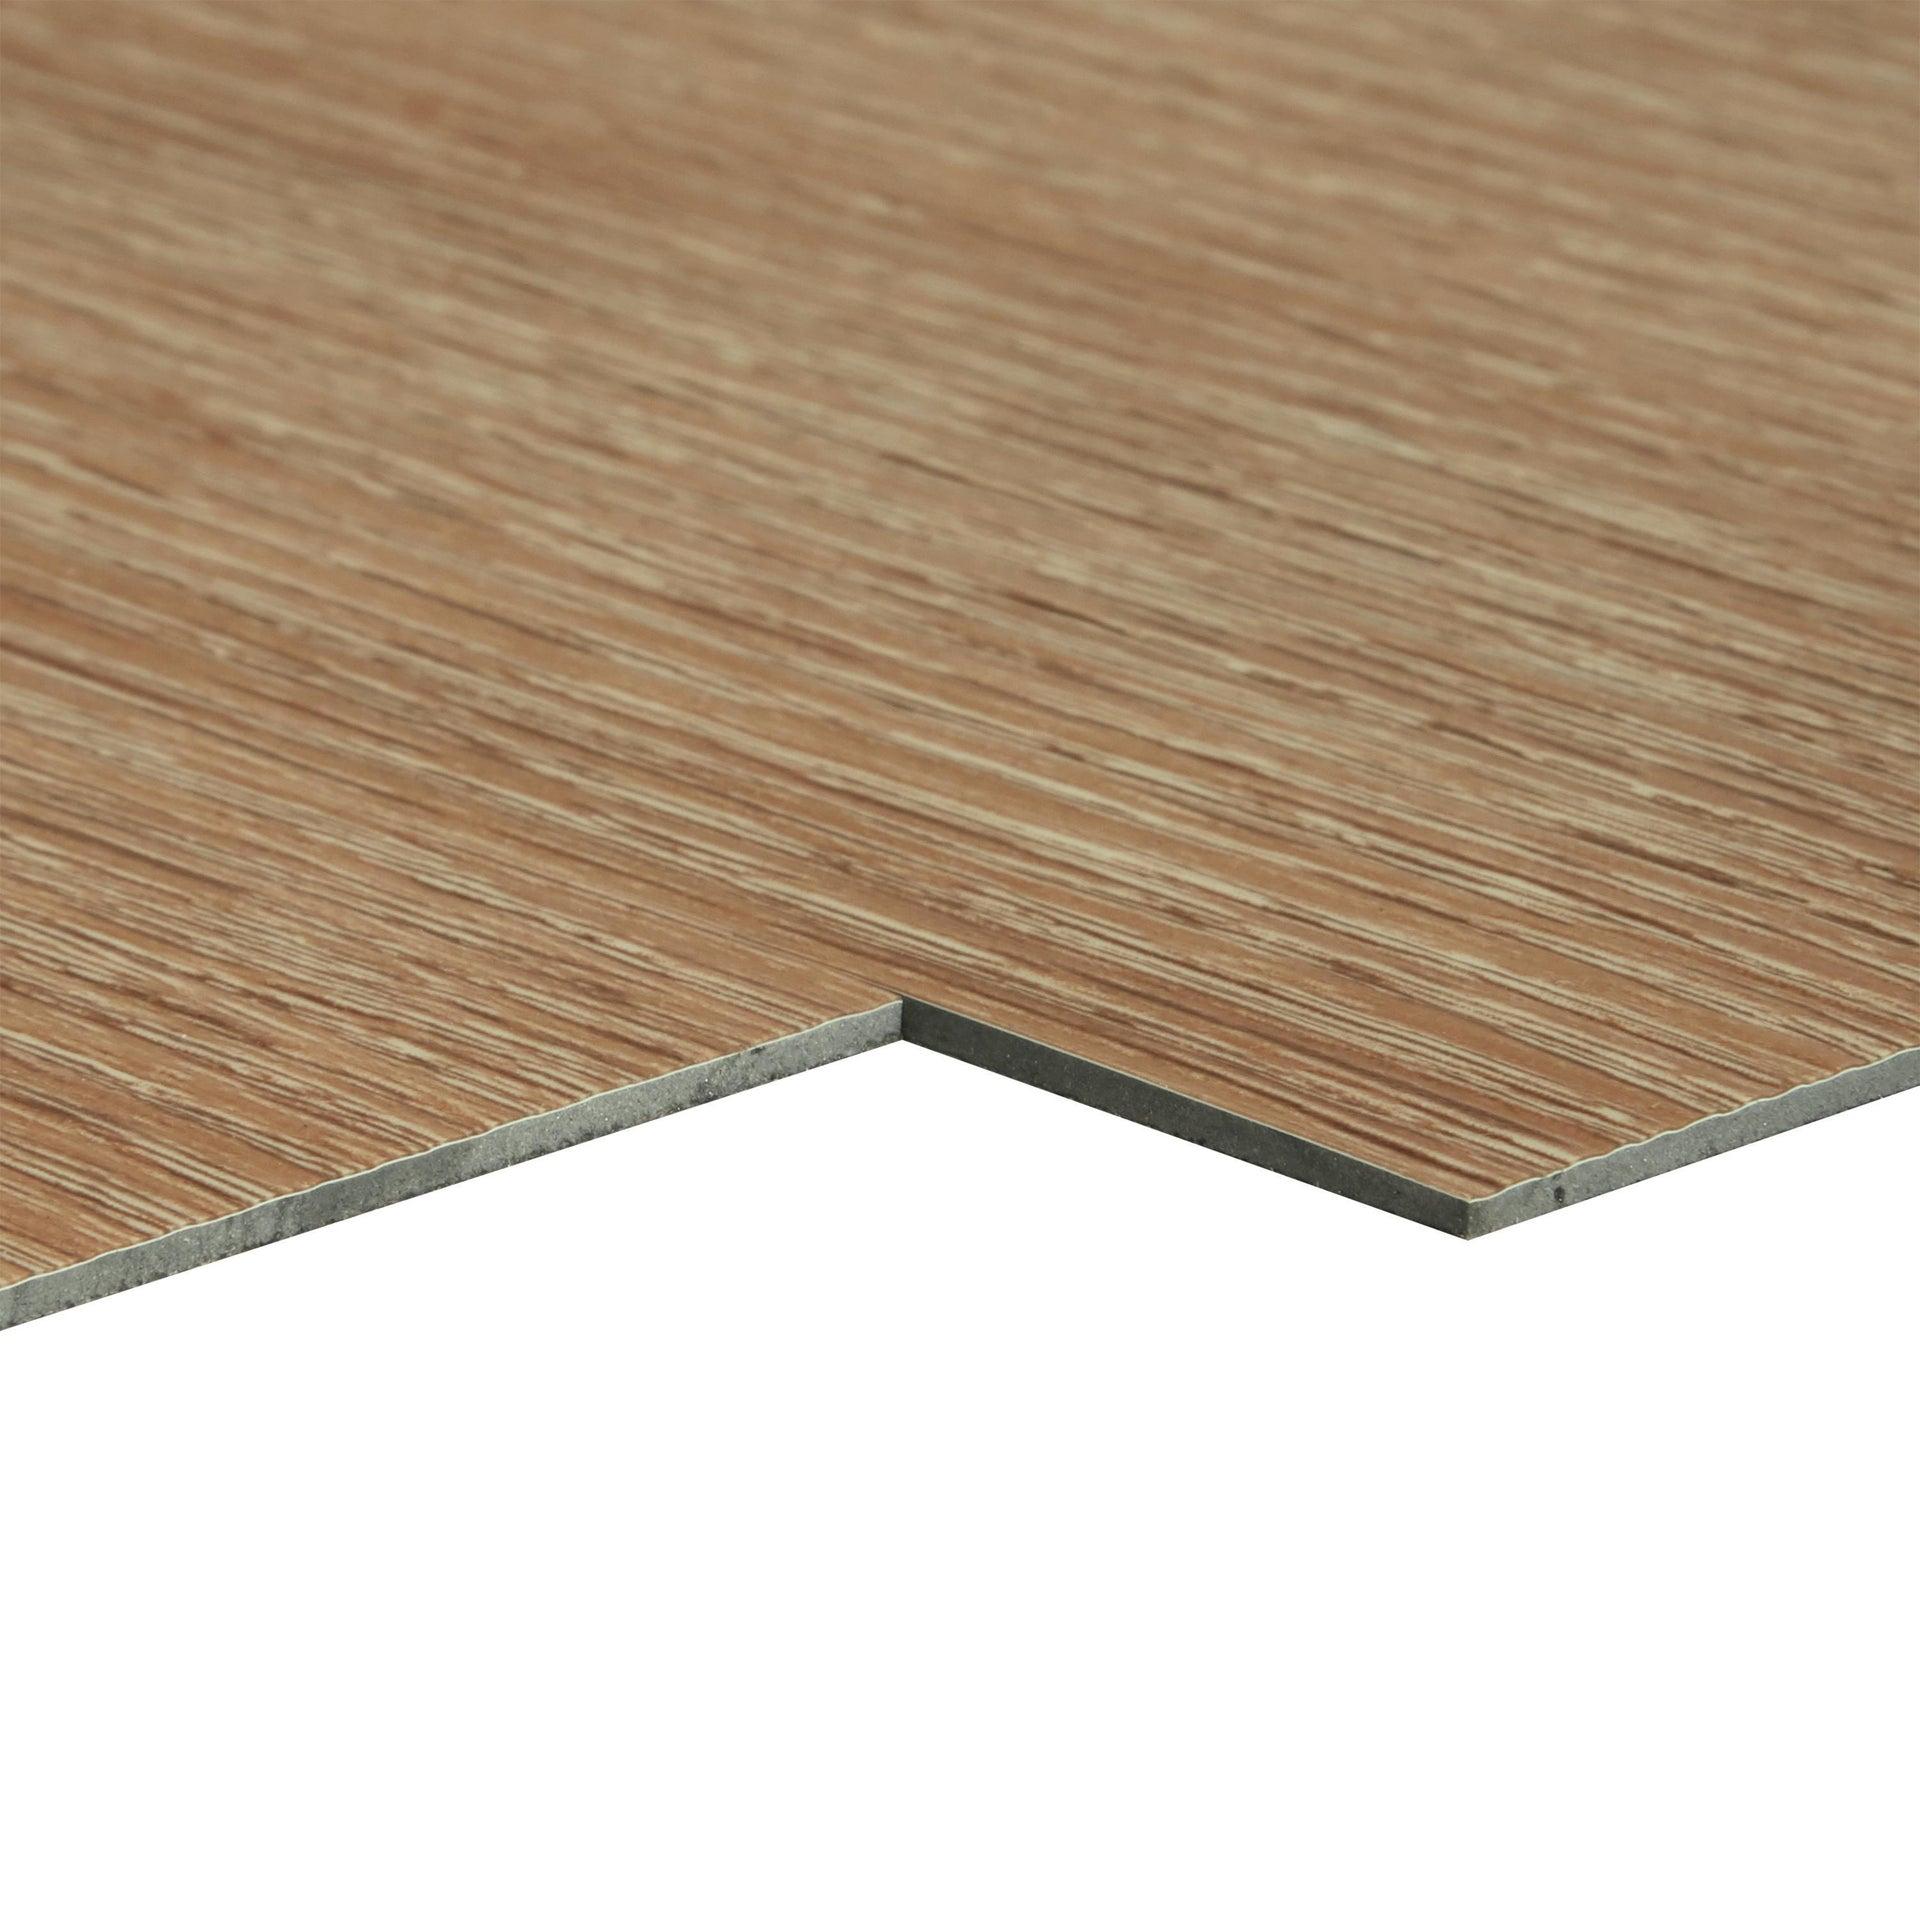 Pavimento PVC adesivo Sadema Sp 2 mm beige - 5